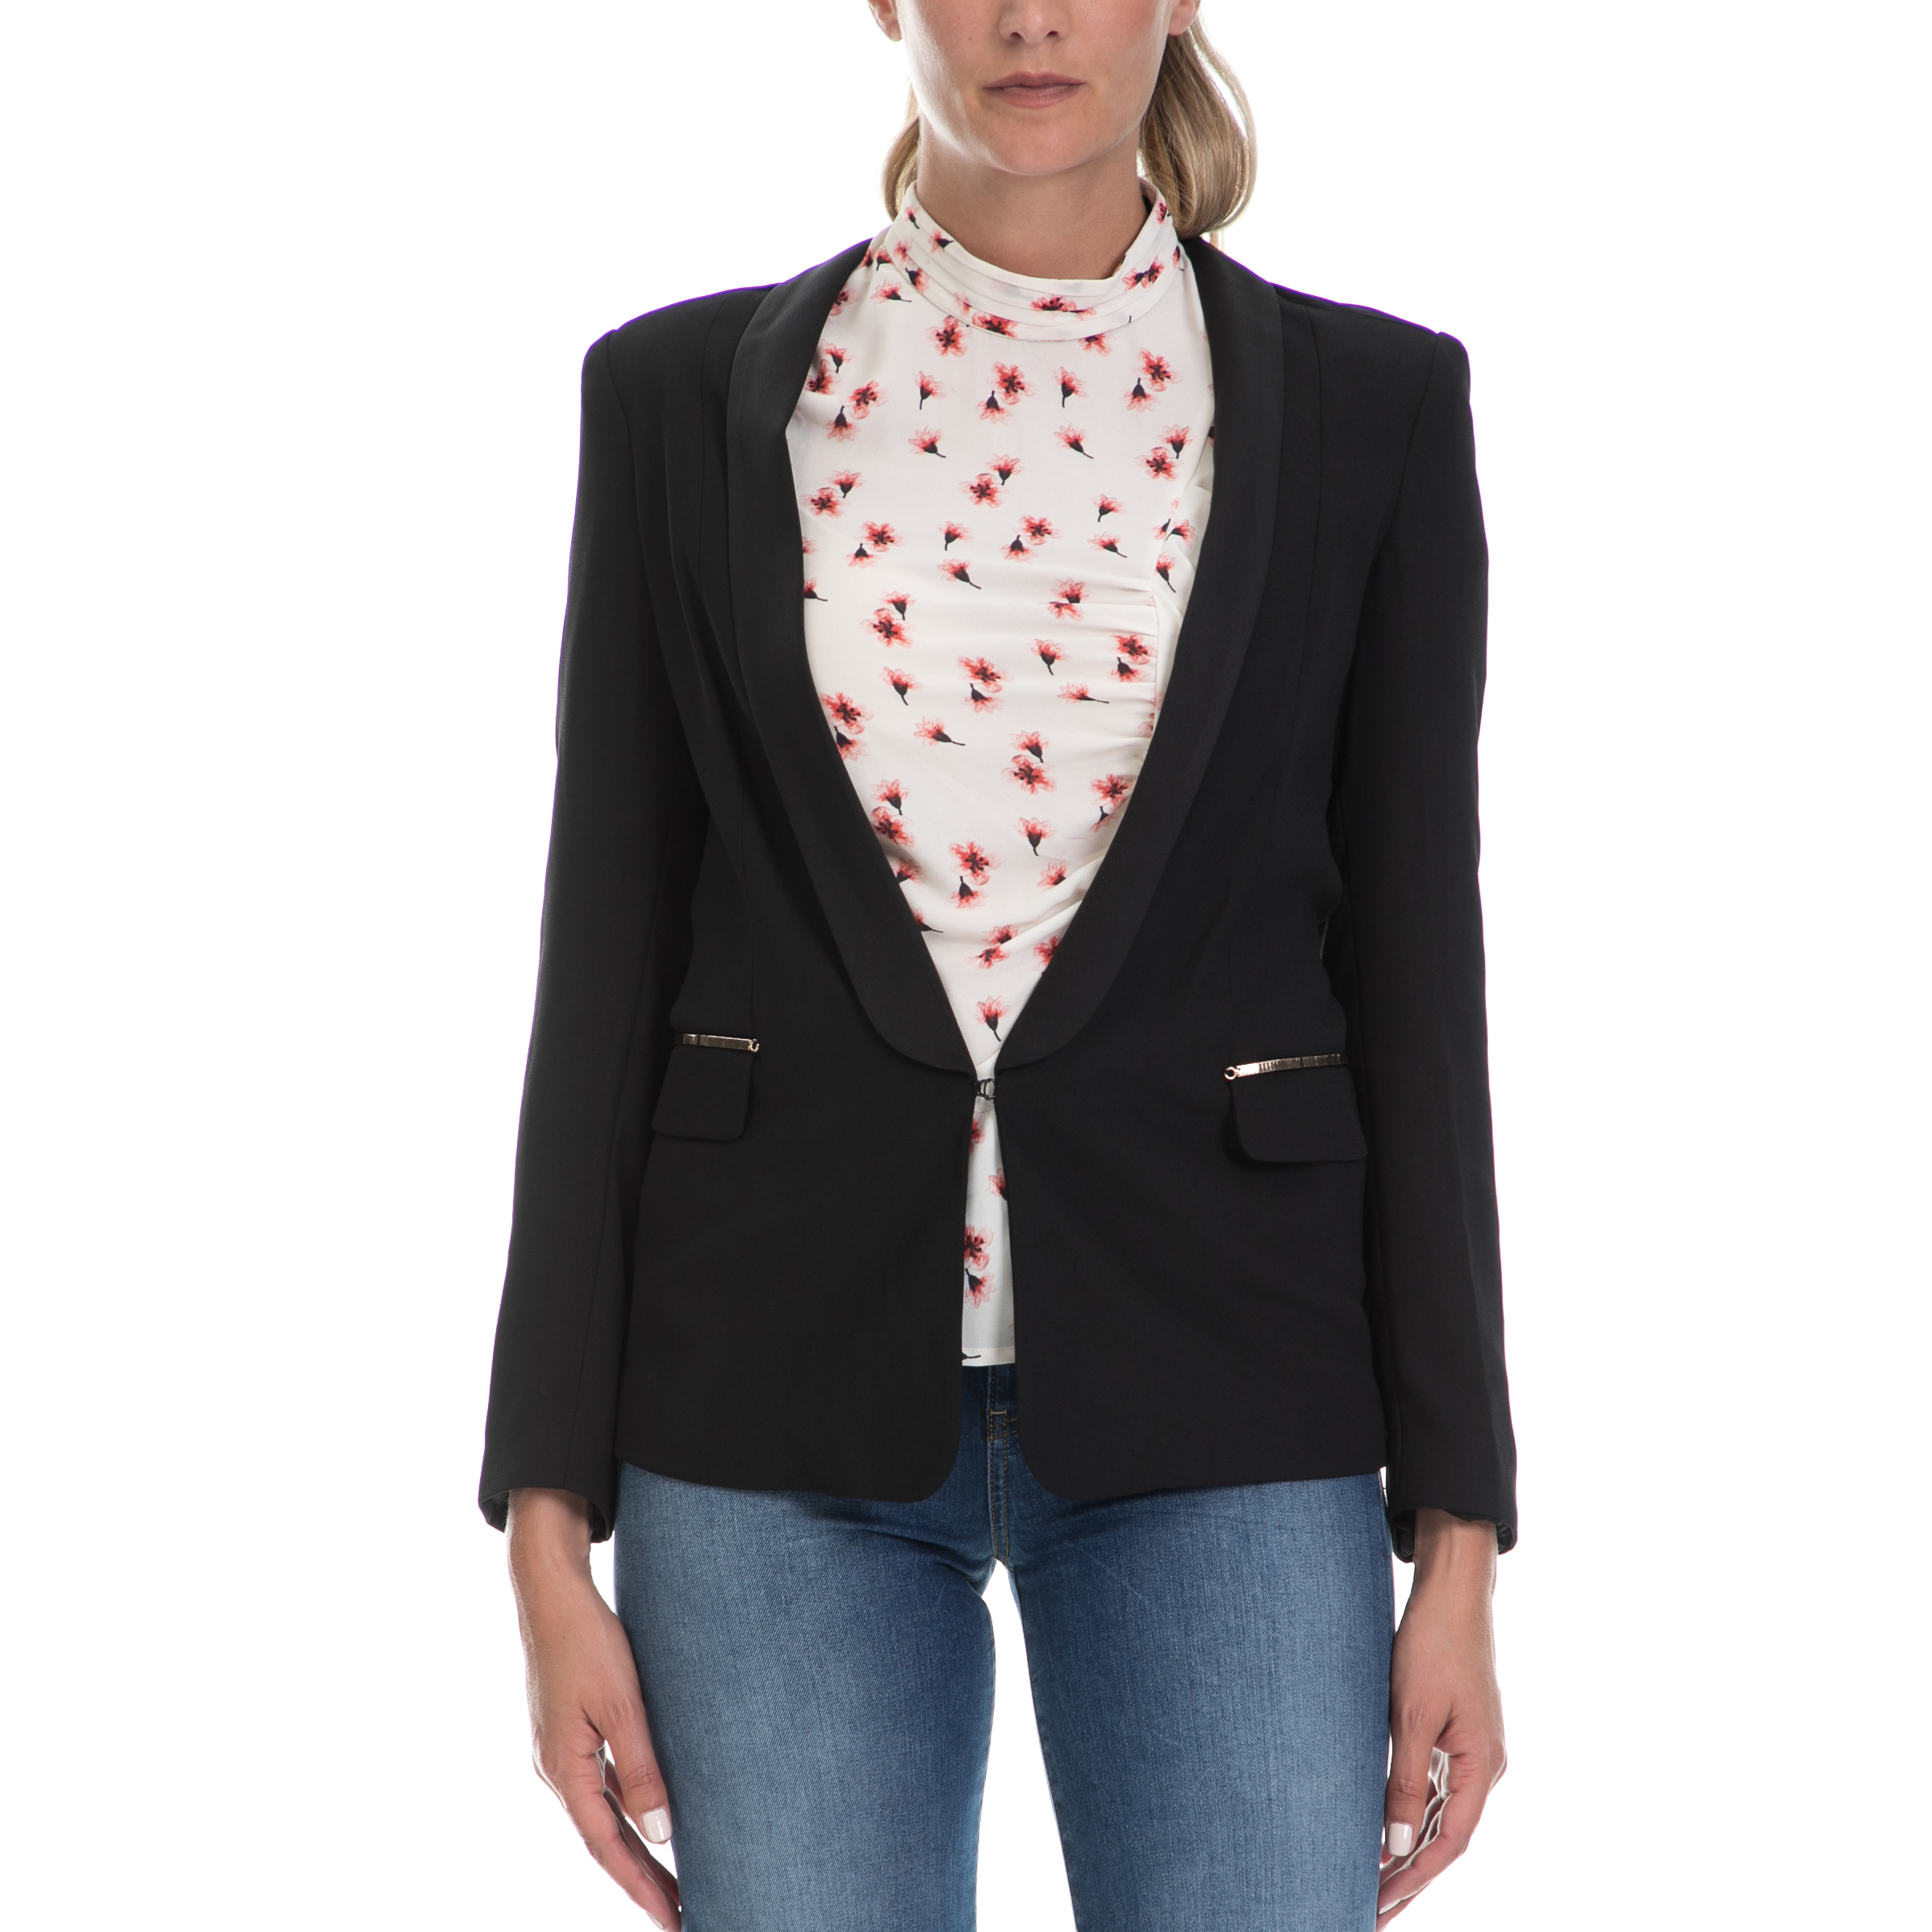 93c6d1e7fba4 GUESS - Γυναικείο τζιν πουκάμισο με τύπωμα Guess BOYFRIEND λευκό ...